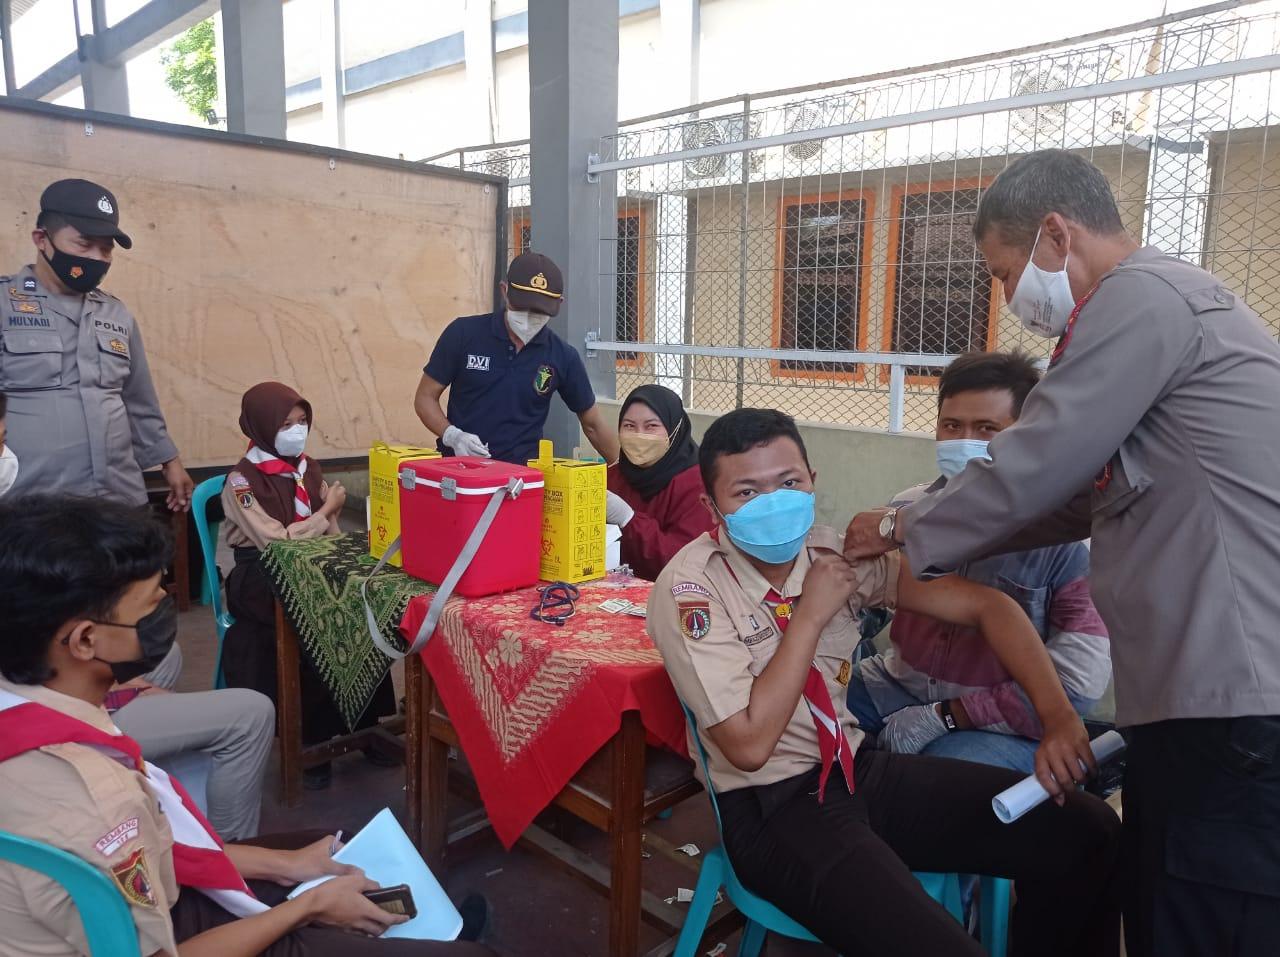 Gandeng Polres Rembang, Ika Smada 96 selenggarakan vaksinasi massal